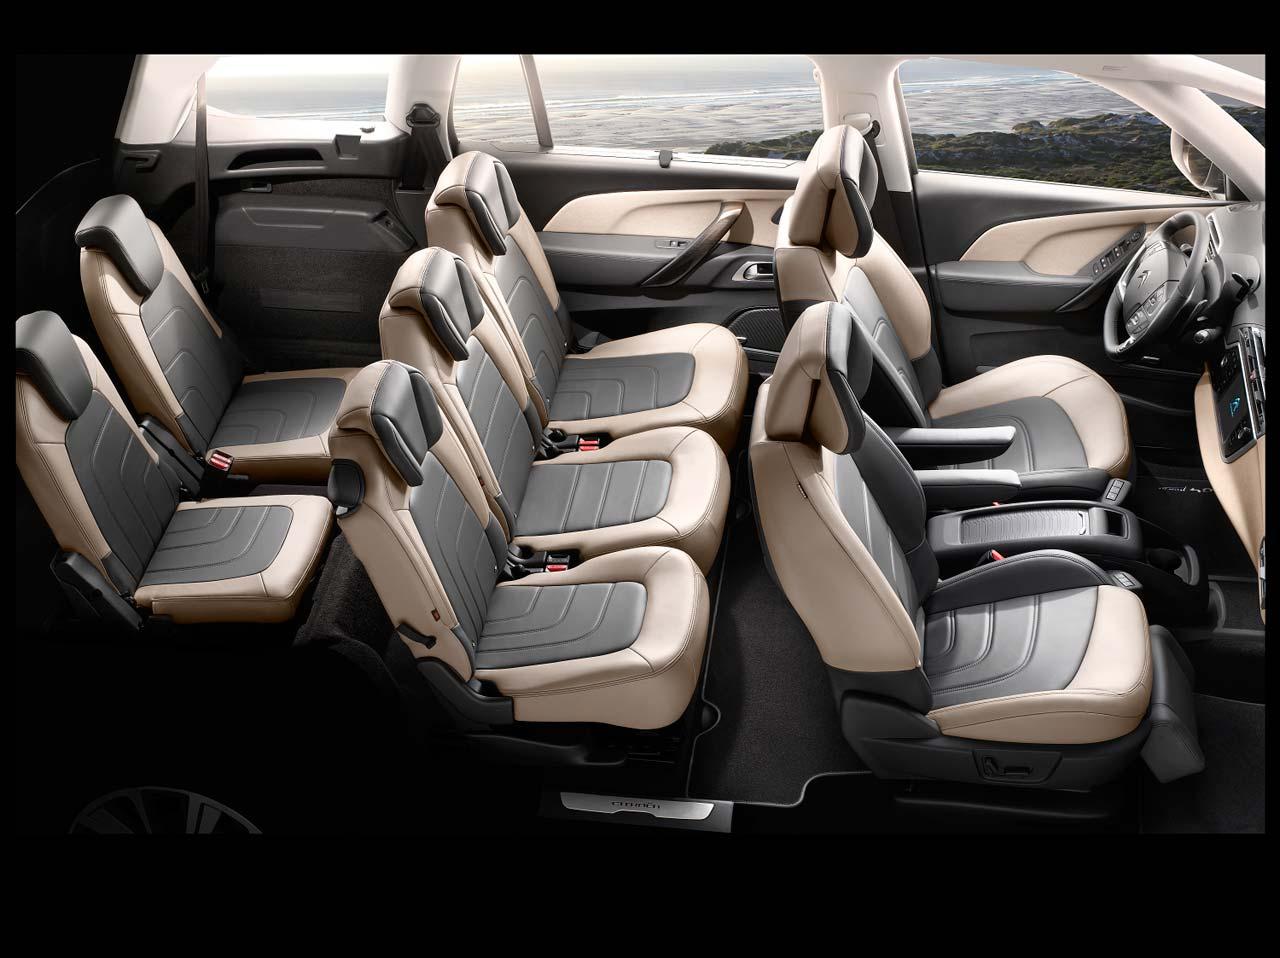 Citroën C4 Picasso y Grand C4 Picasso interior